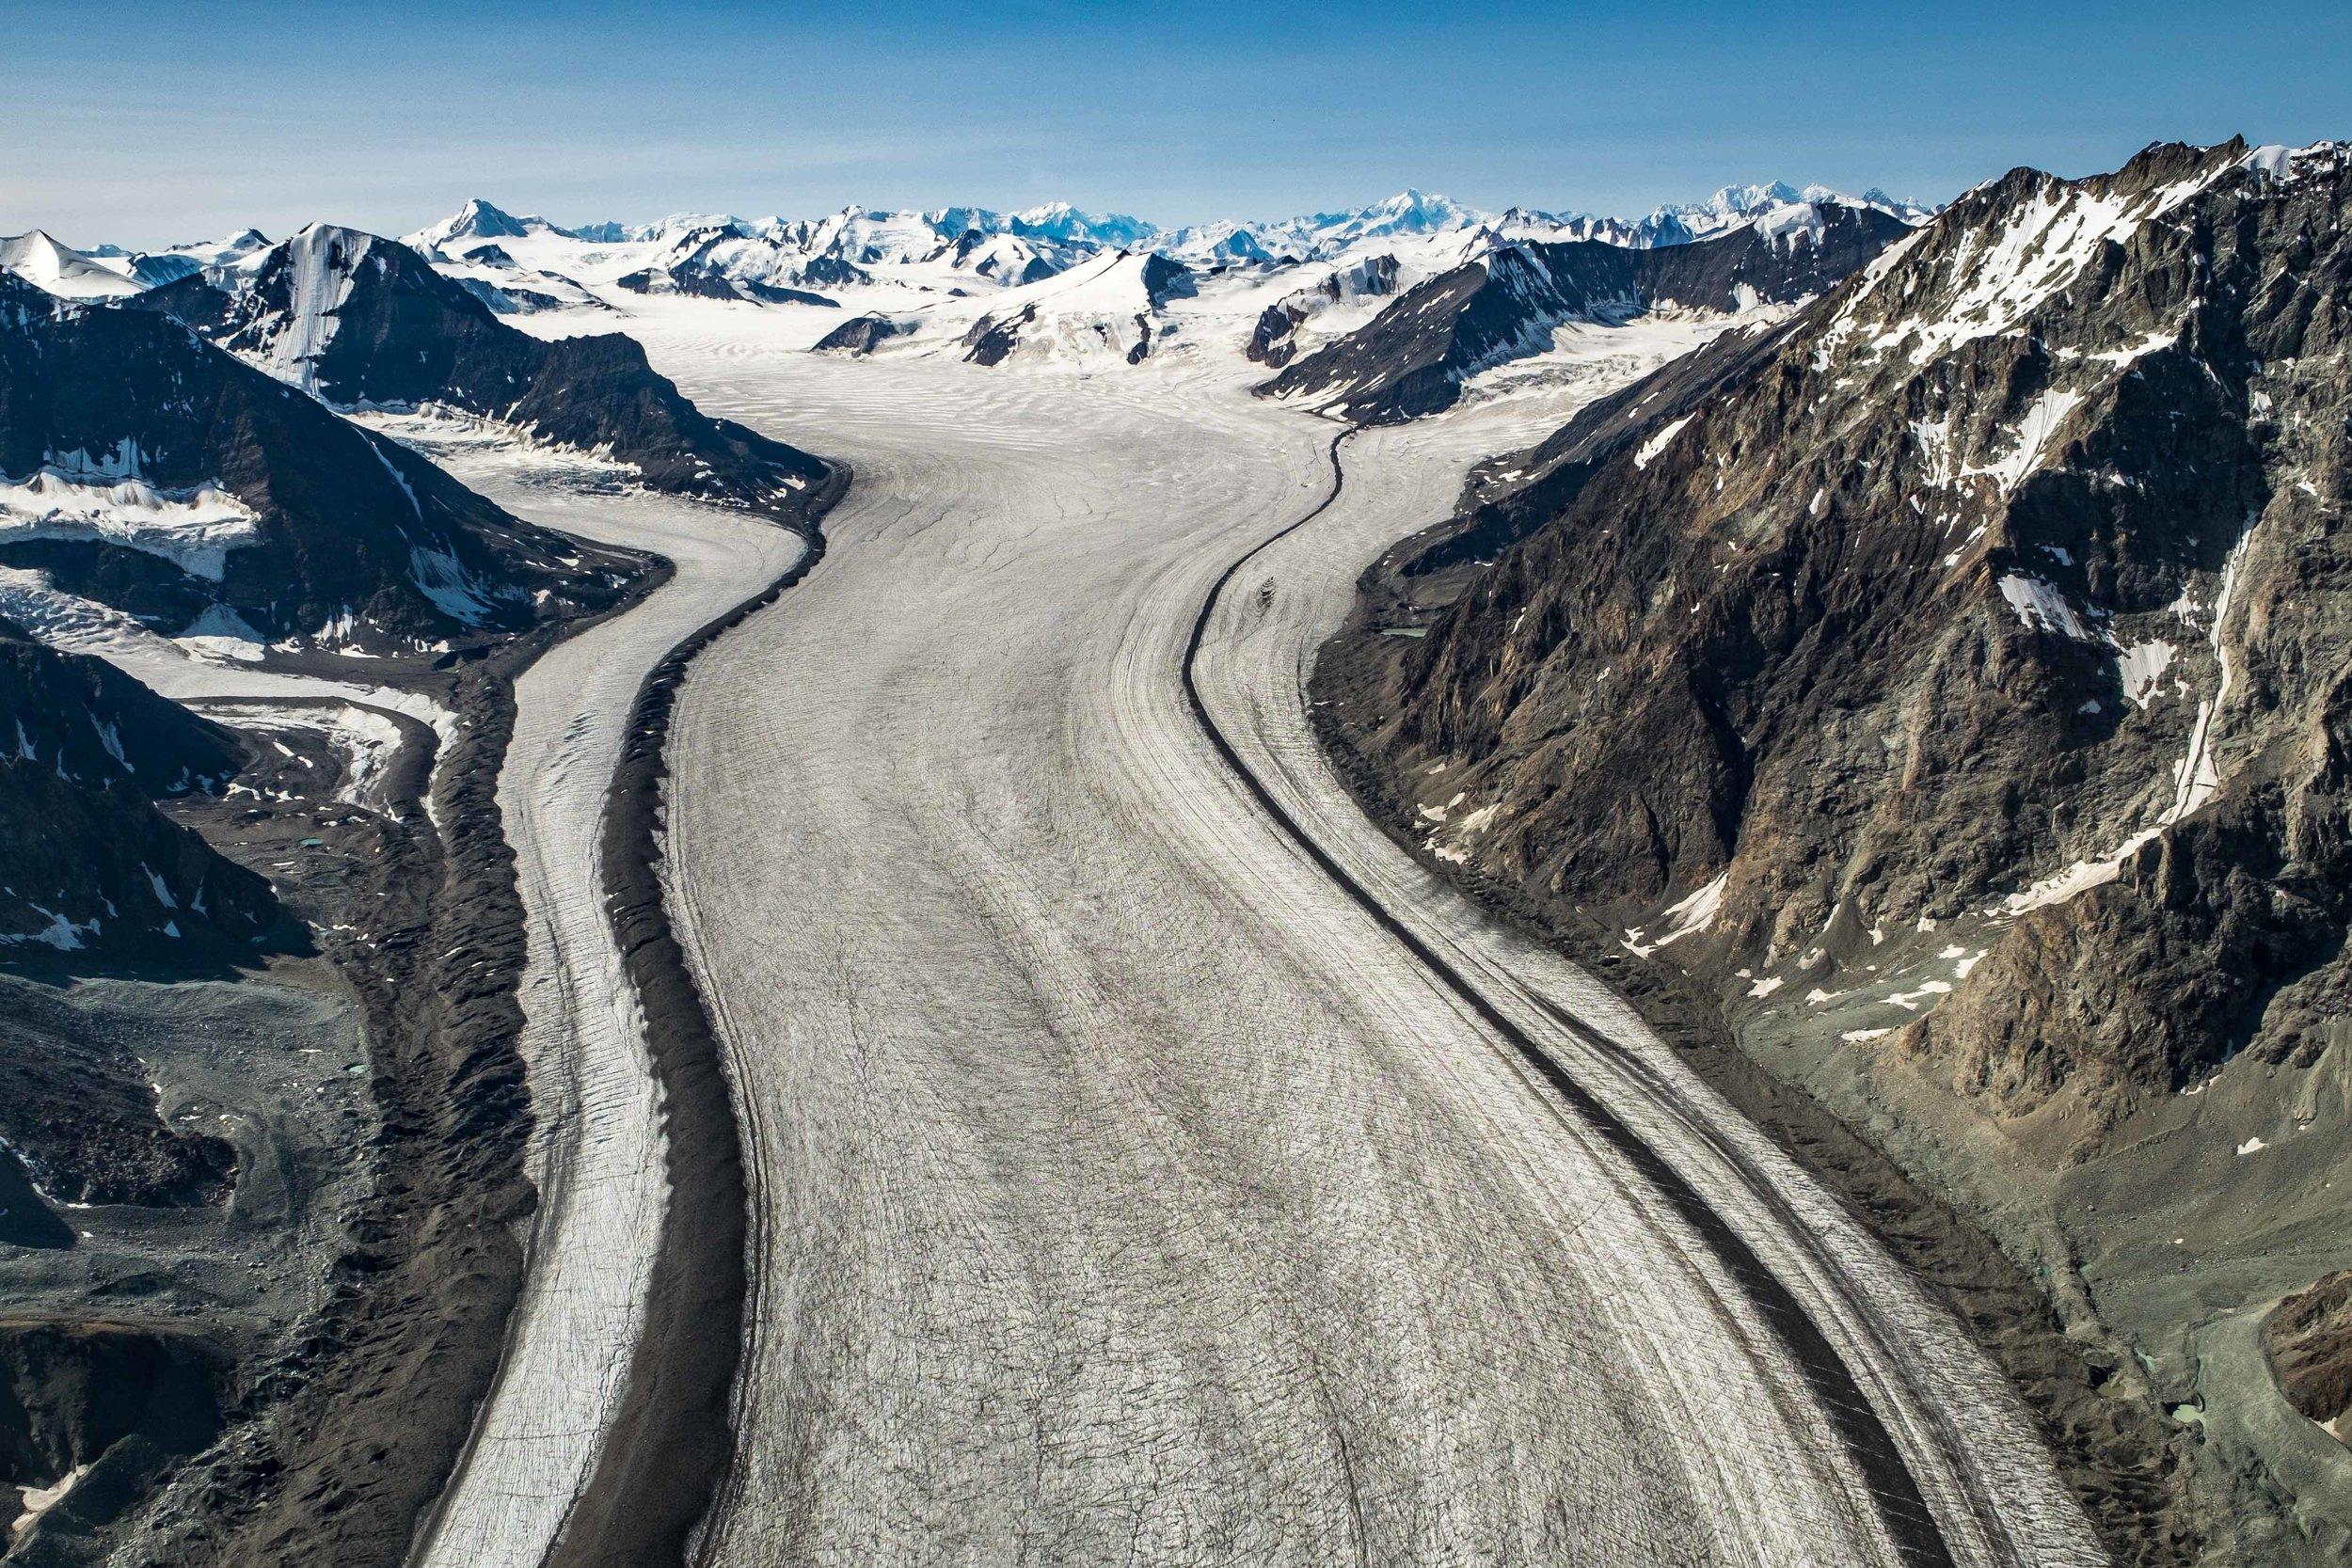 Heading back to McCarthy we saw so many glaciers.